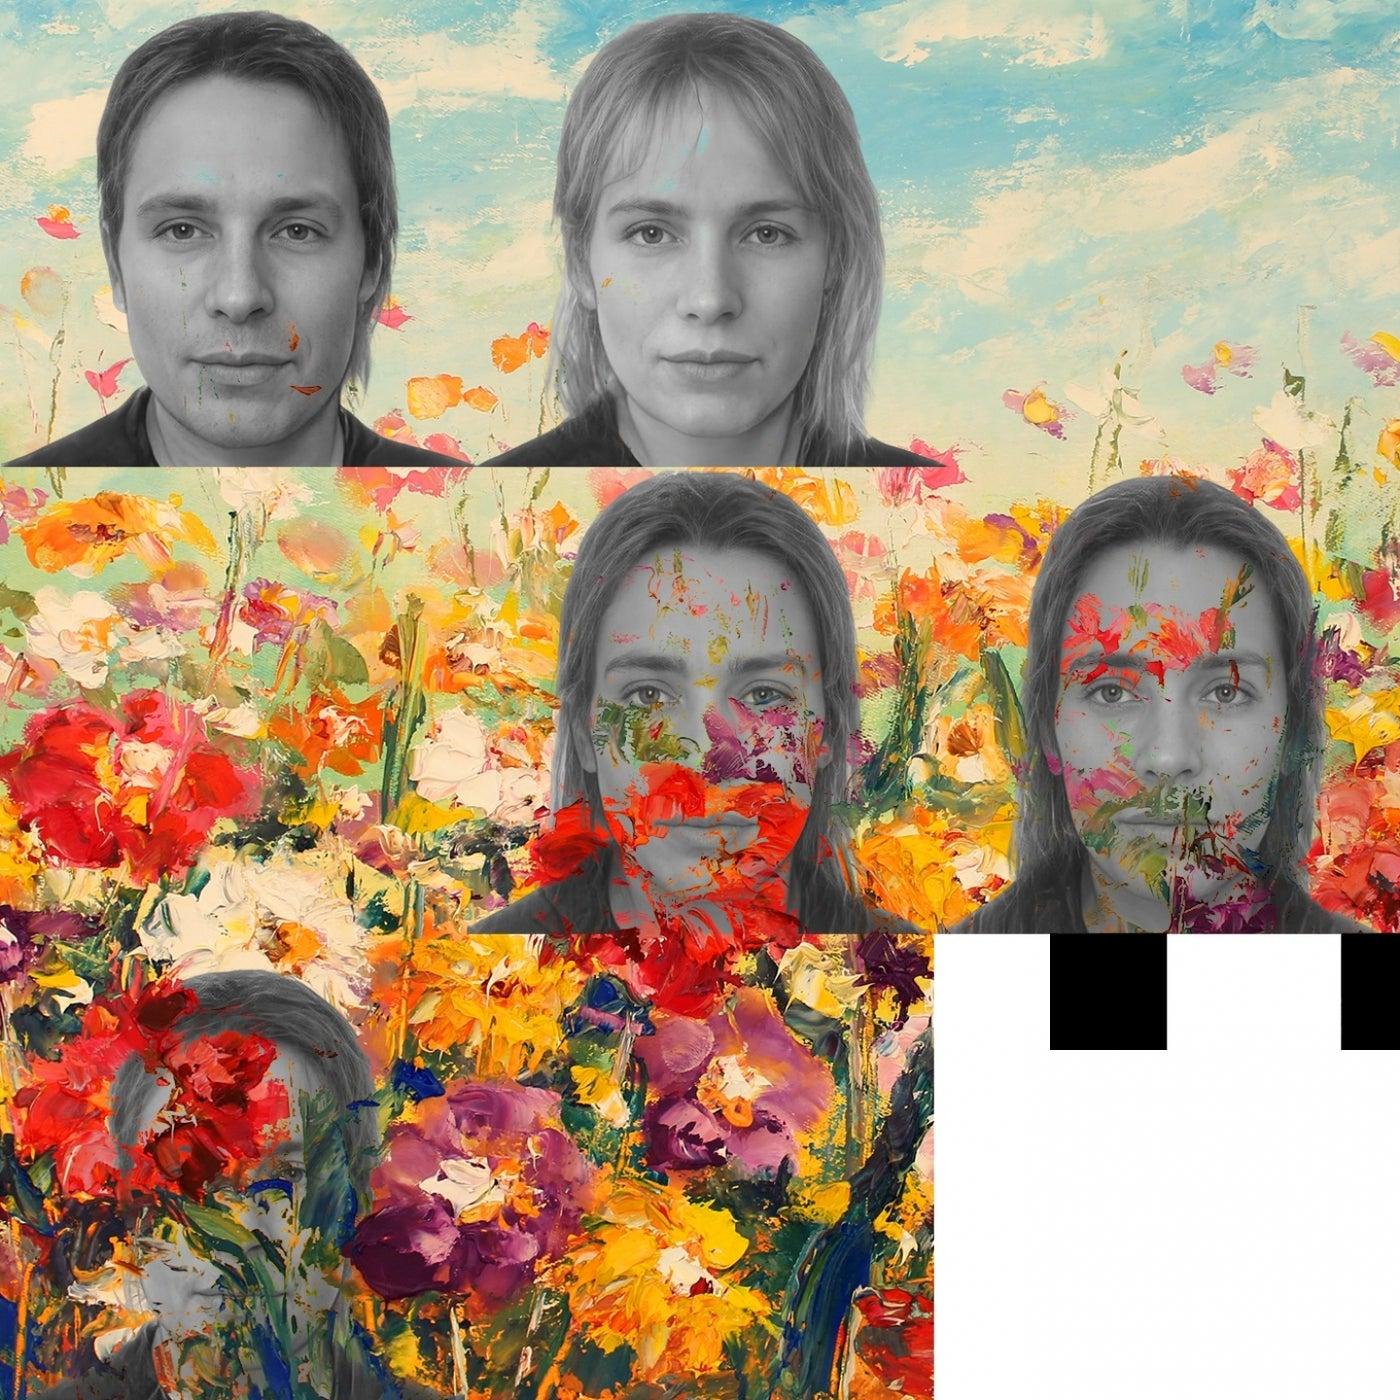 Blooming Flower (Whitesquare Remix)